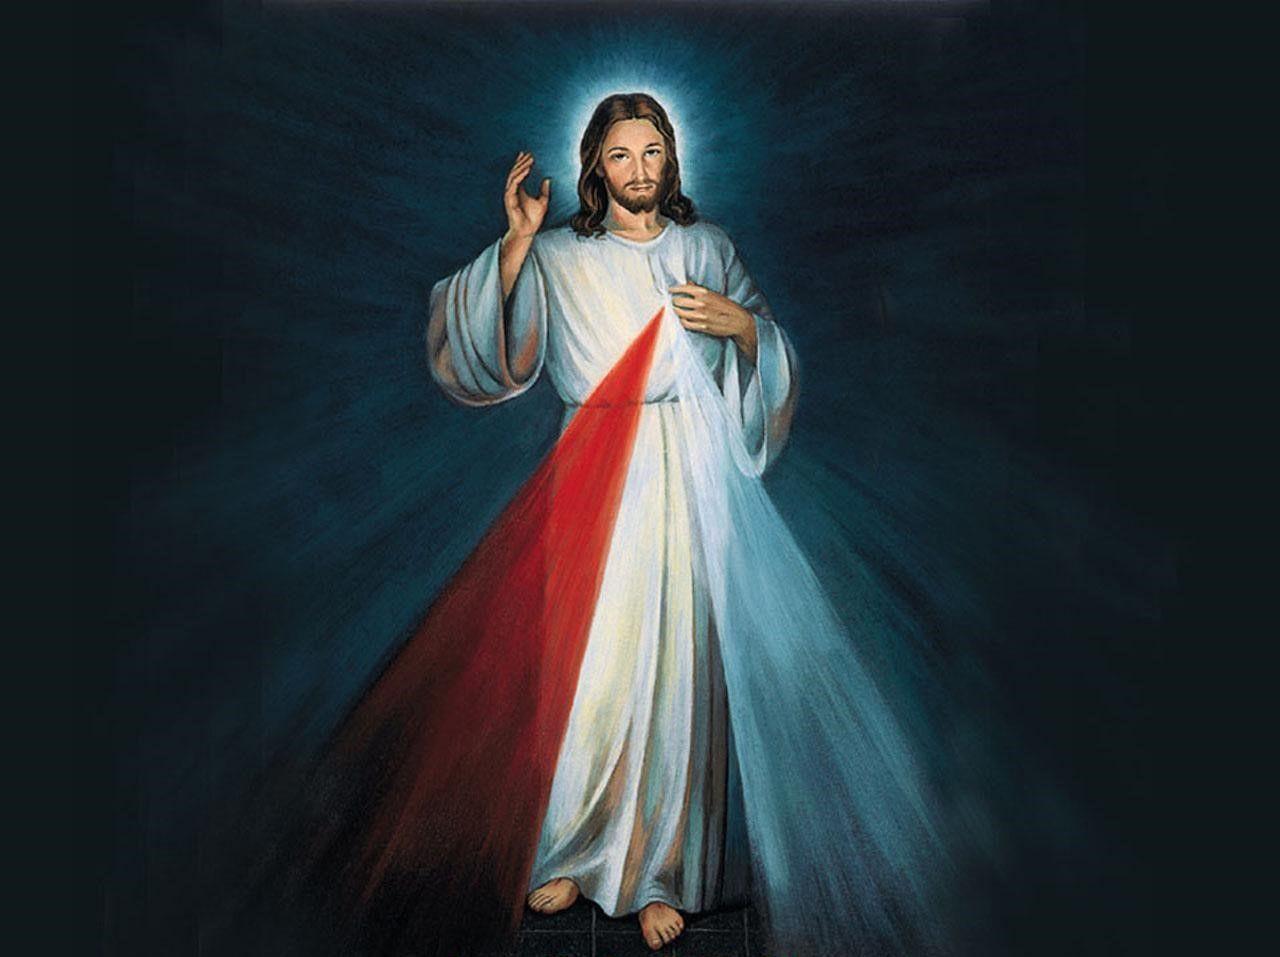 Božansko milosrđe – Kristove rane i Očevo lice